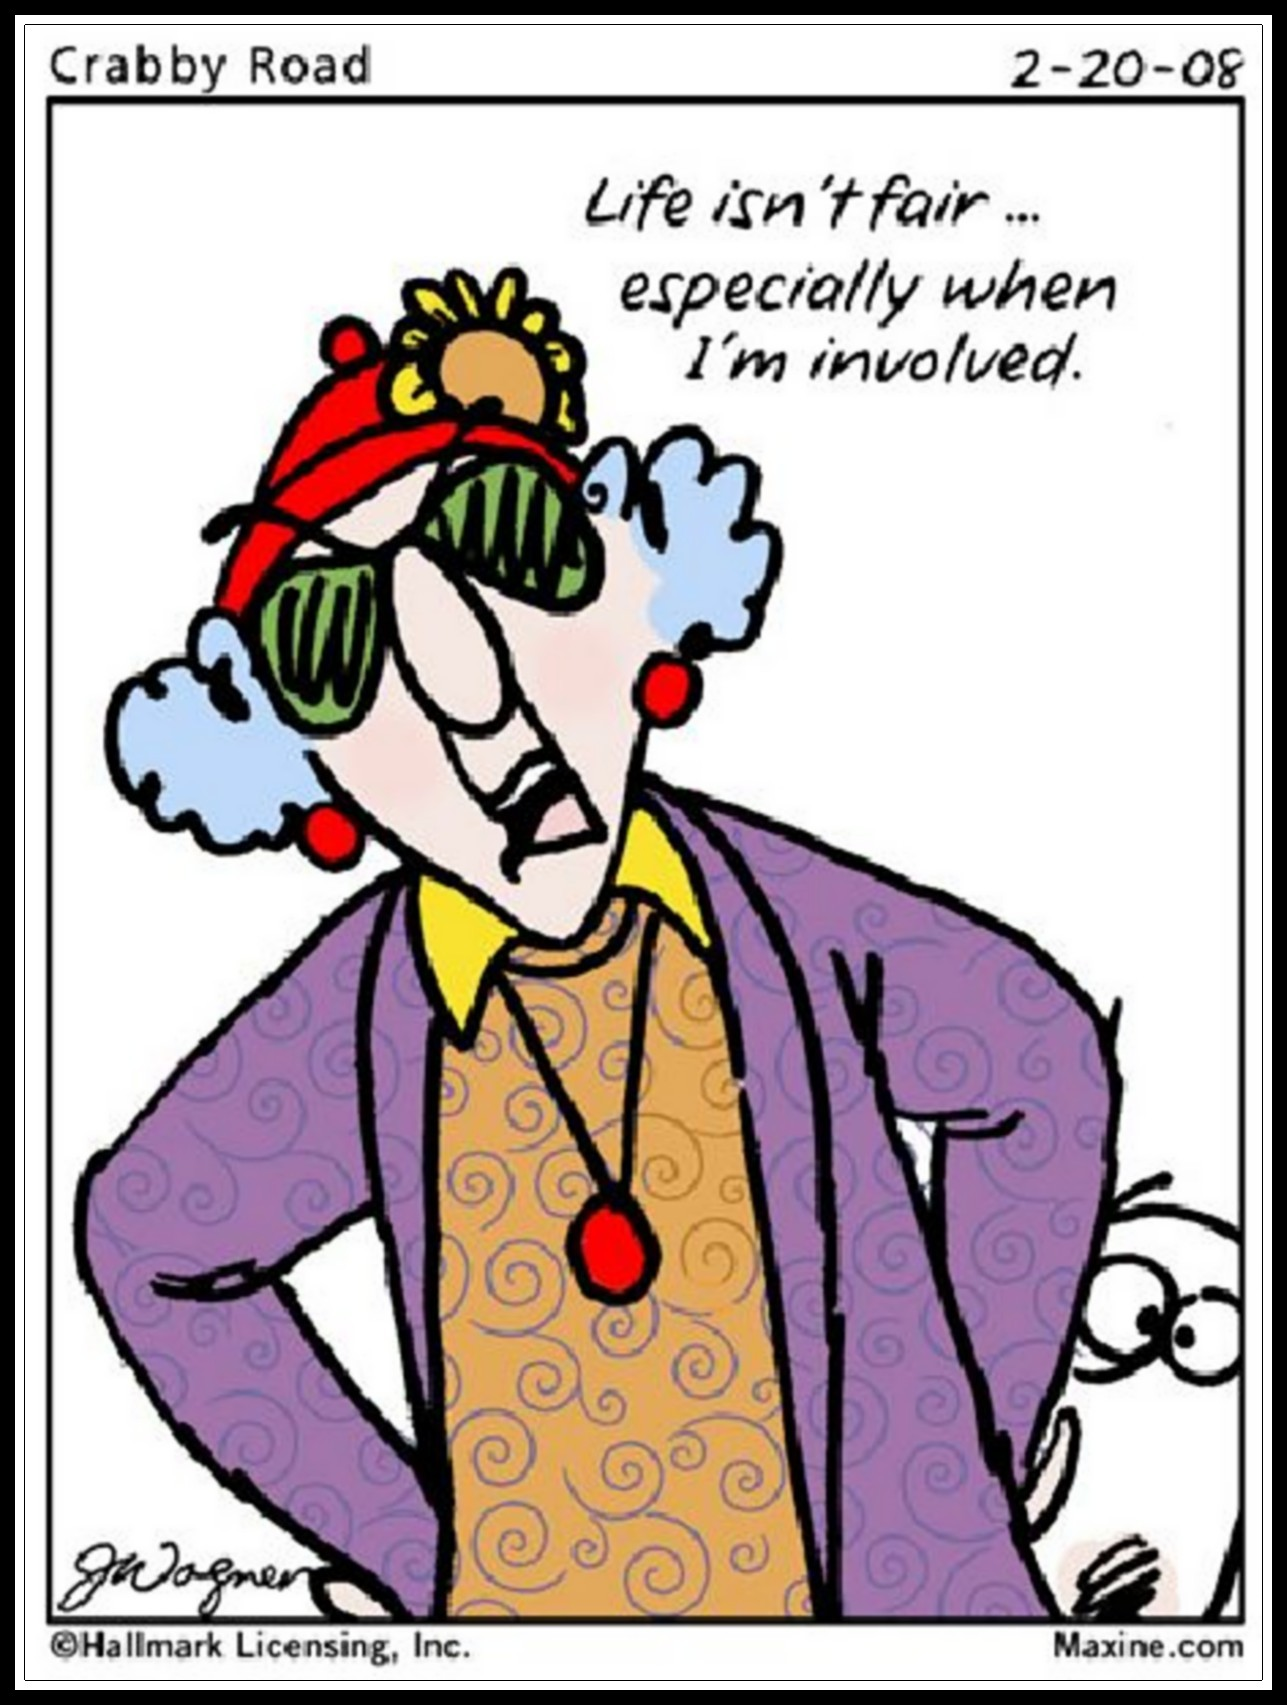 maxine cartoons aging quotes aunty funny humor acid lady cartoon crabby senior jokes person laugh favorite sarcastic bing comic birthday